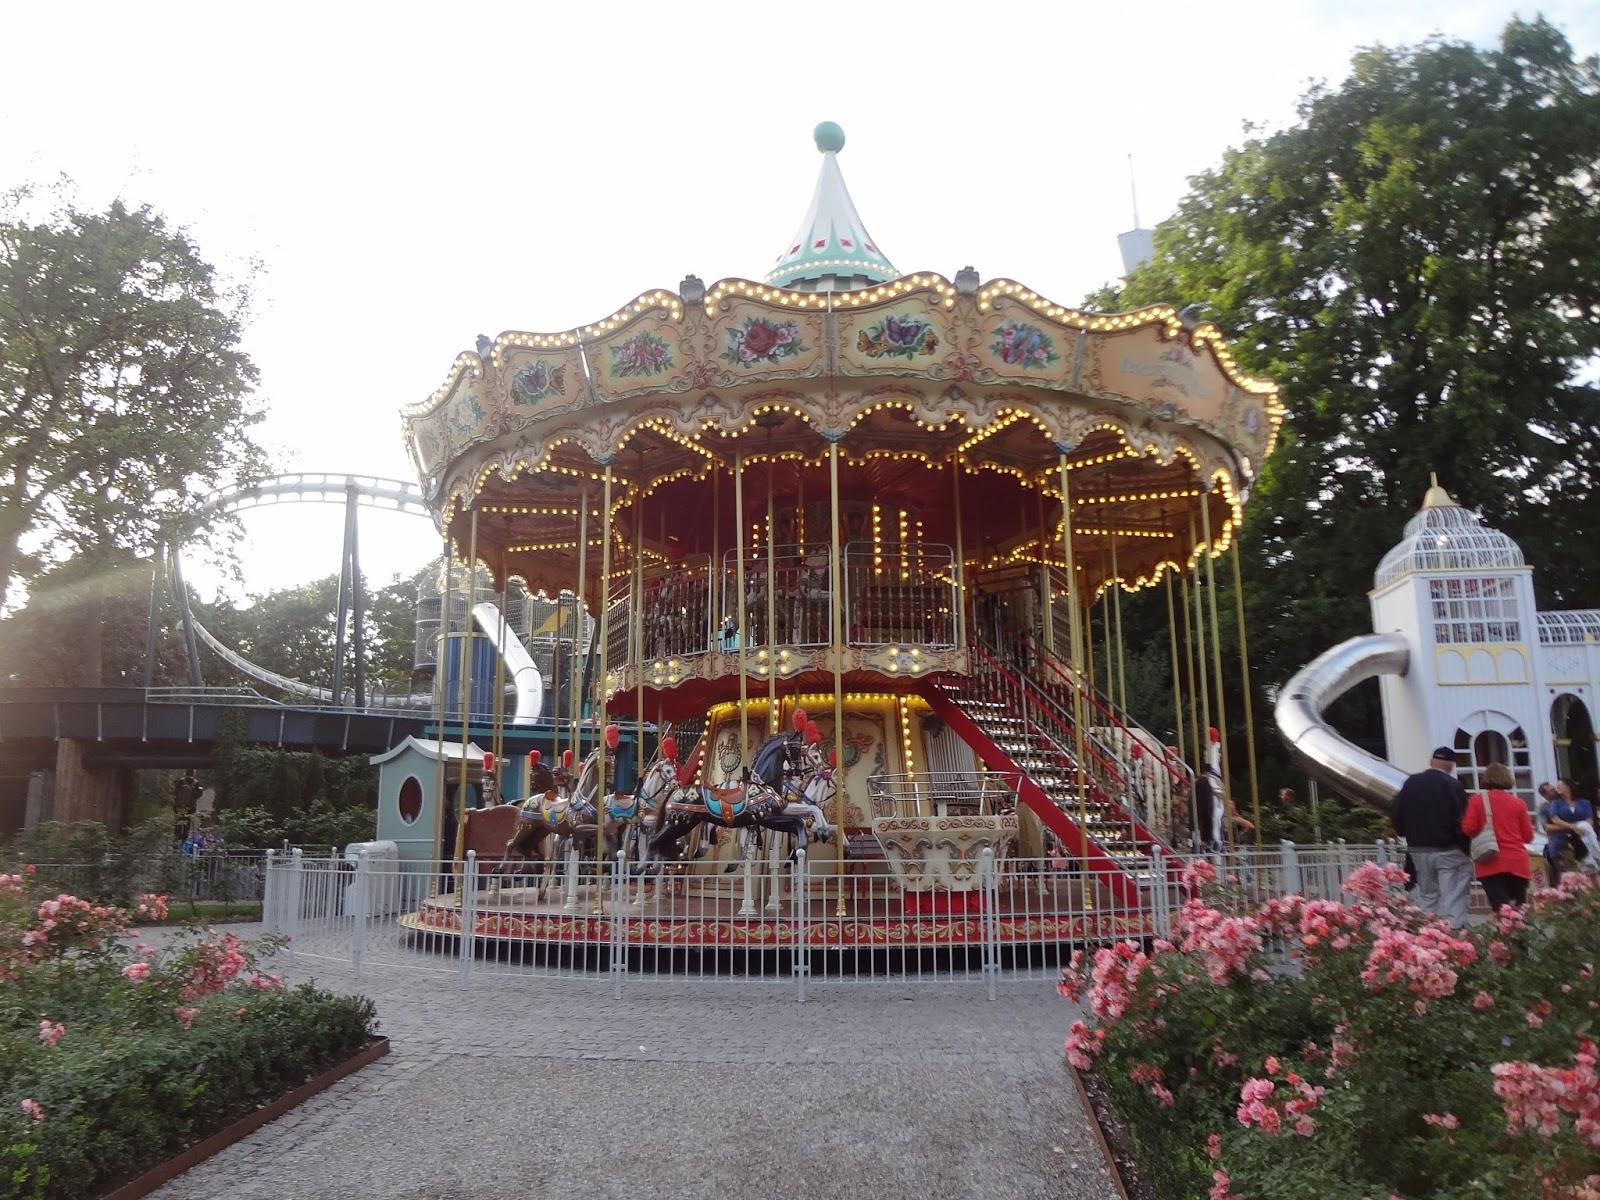 carousel liseberg